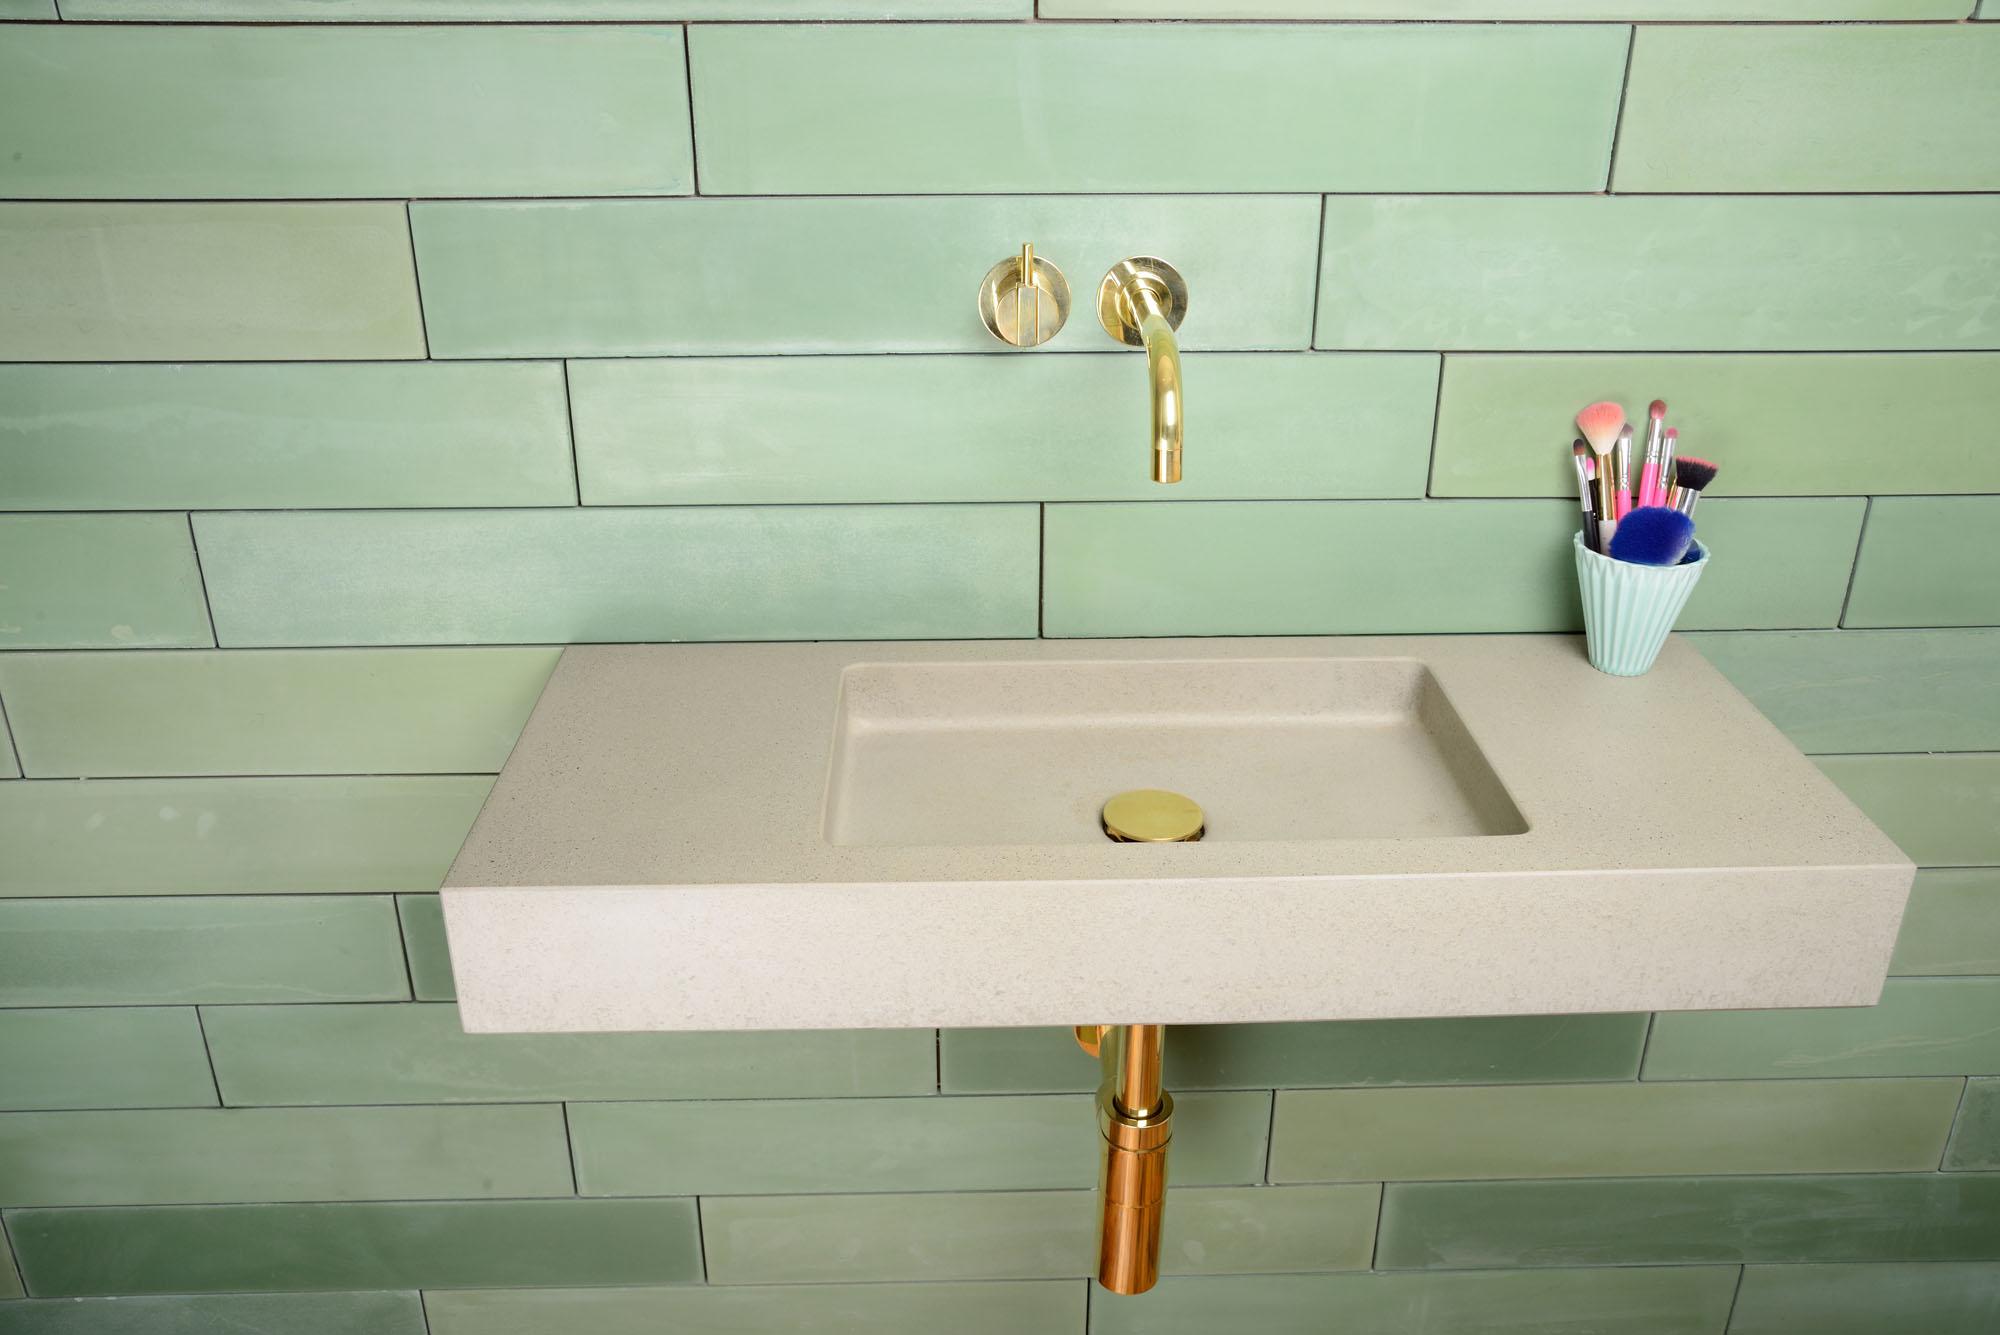 betonwaschtisch pitch p a3 spa ambiente. Black Bedroom Furniture Sets. Home Design Ideas